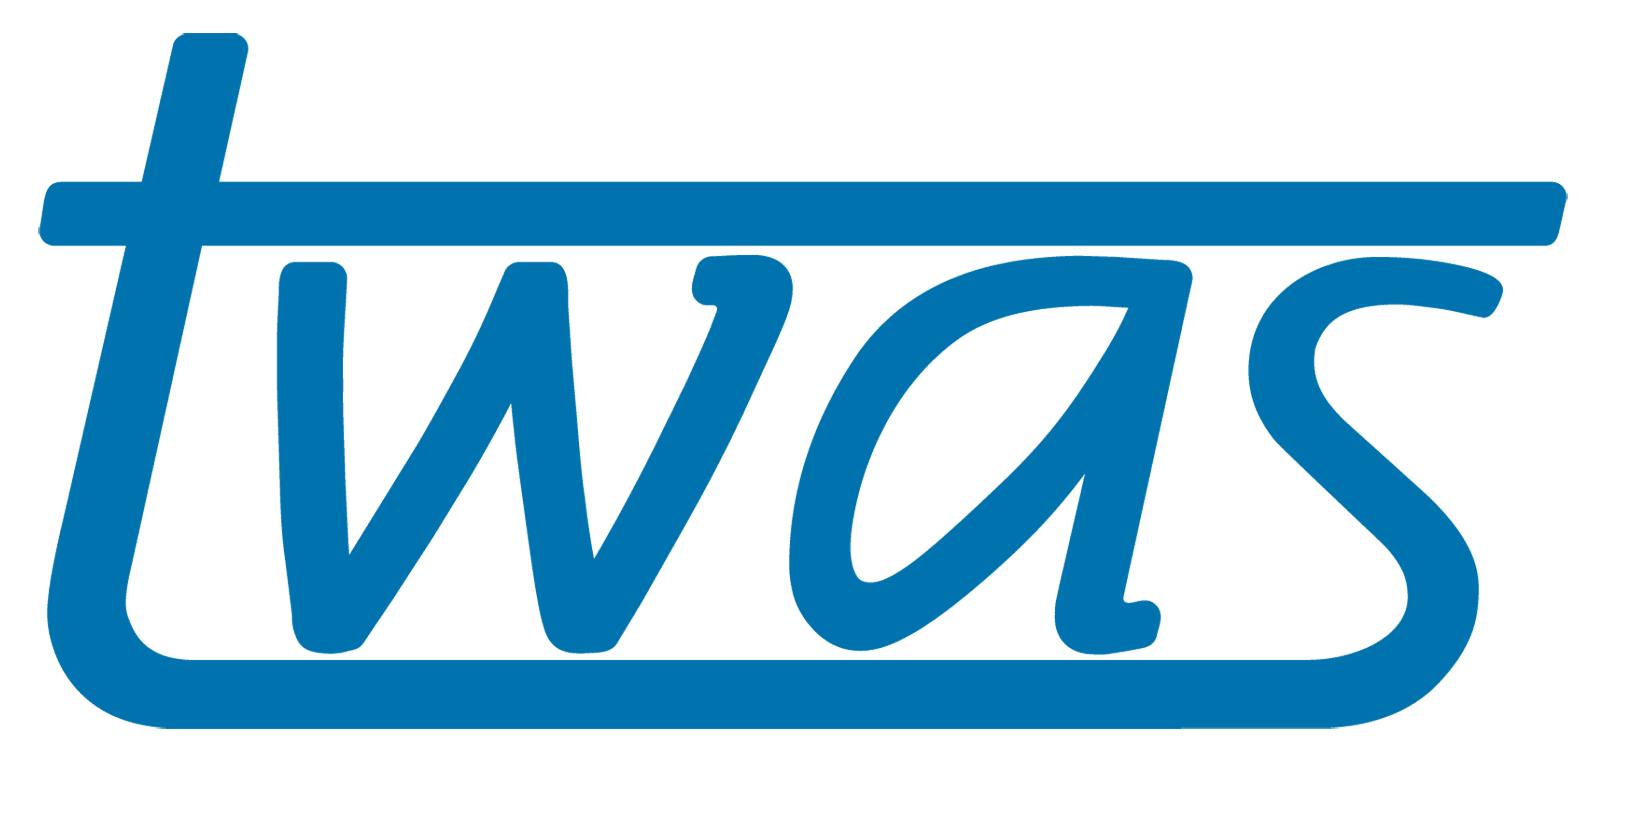 TWAS-UNESCO Associateship Plan for Scientists 2018-2020(Moneyed)